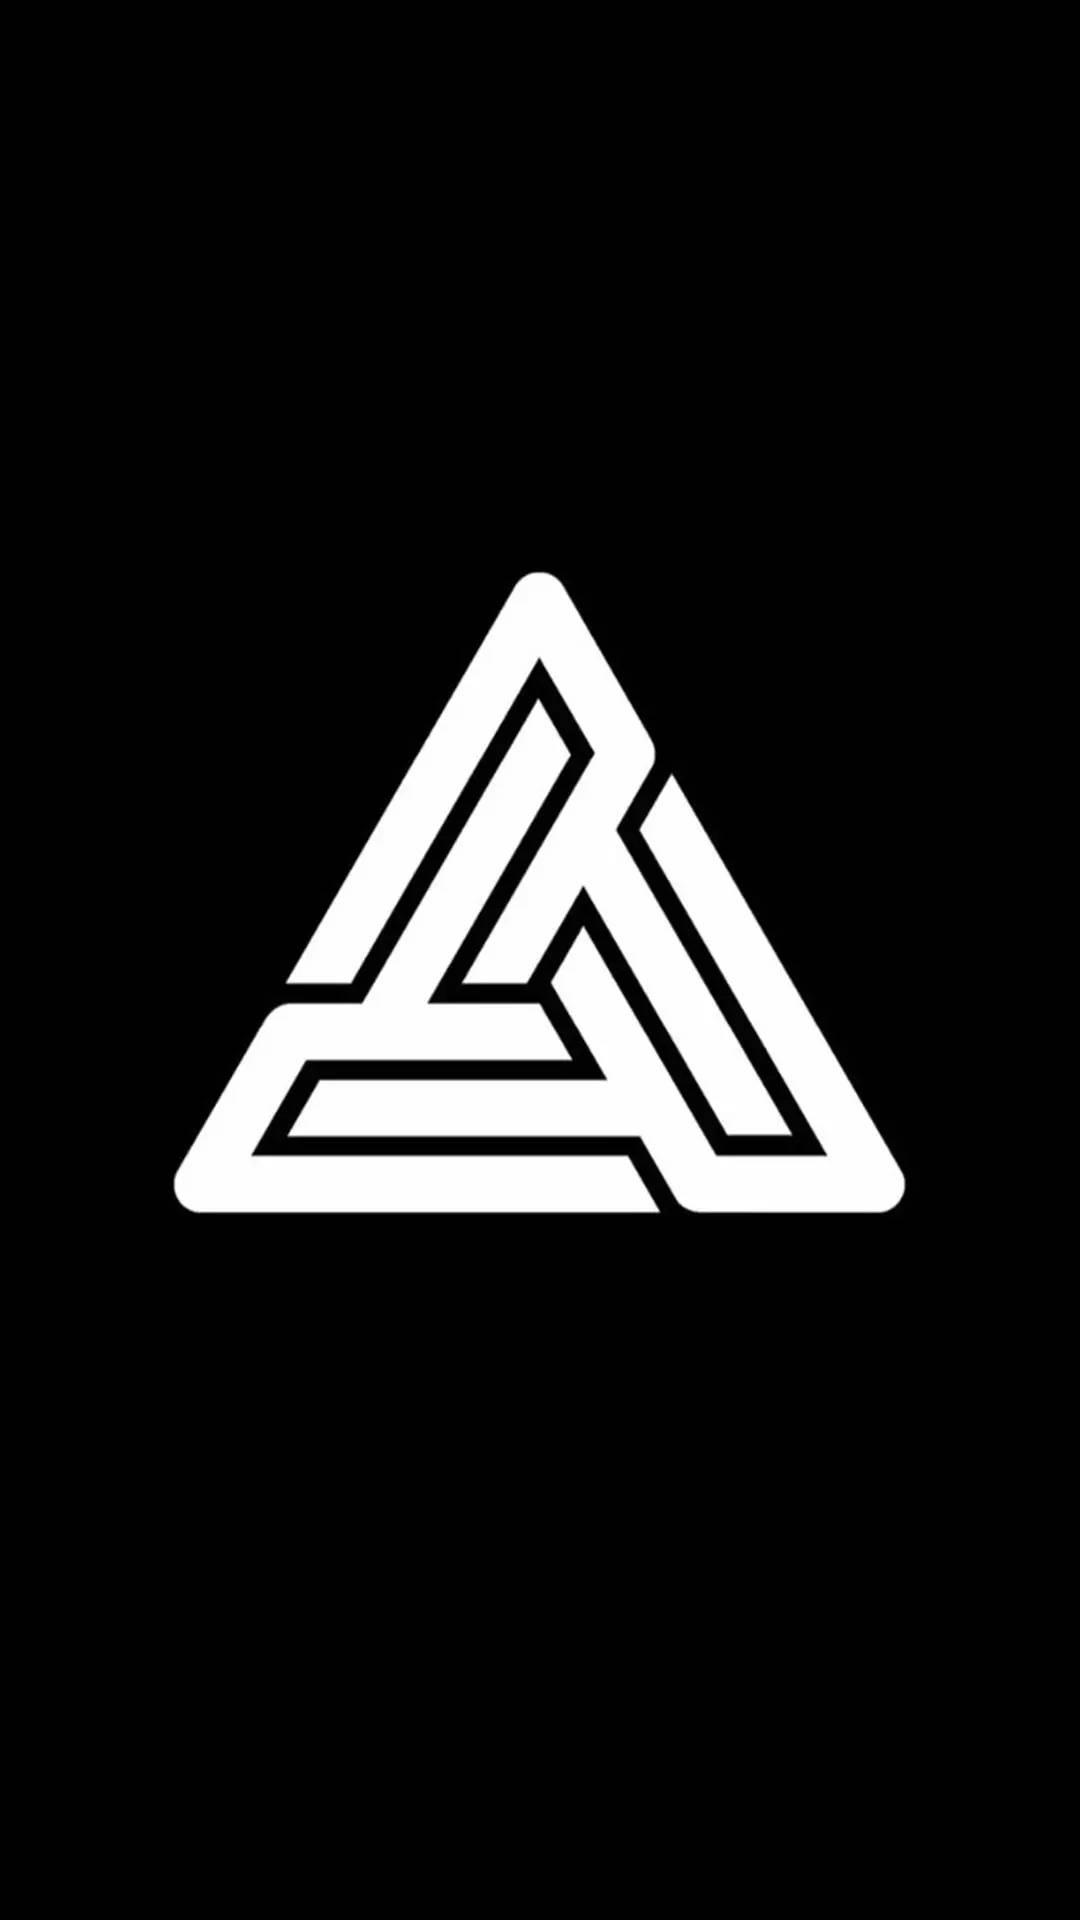 black pyramid wallpaper  Black pyramid Logos